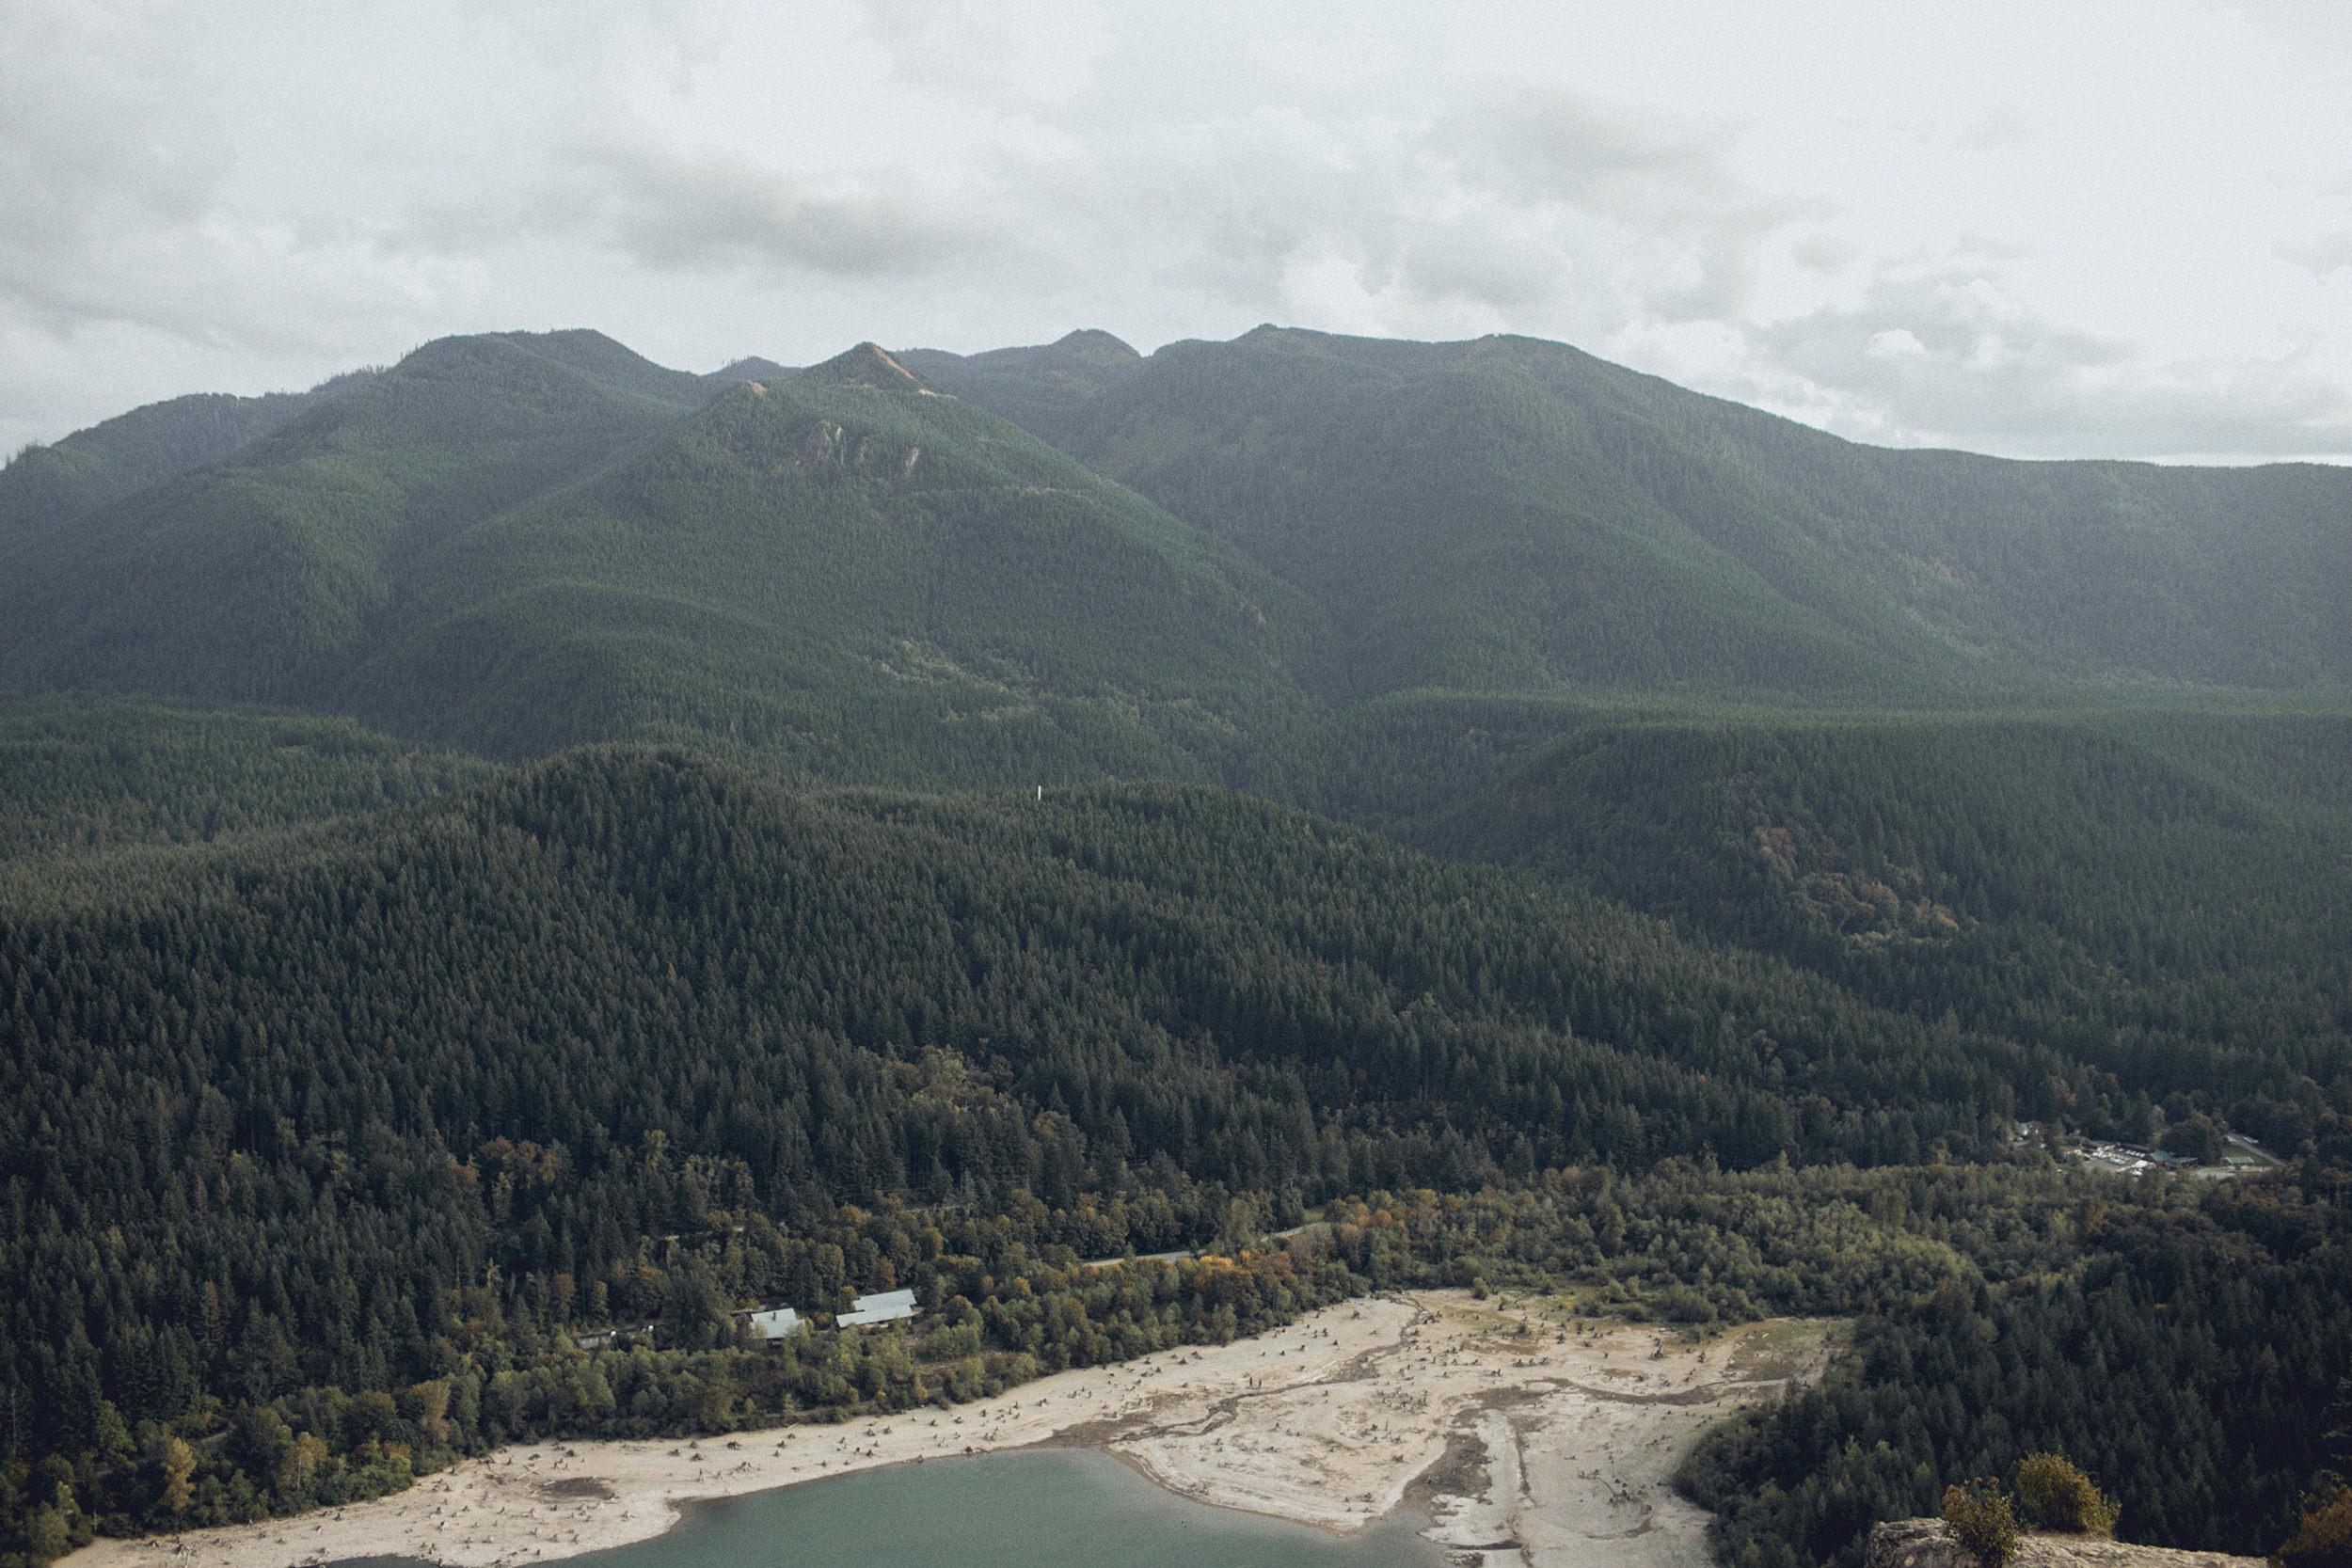 the view from rattlesnake ridge summit